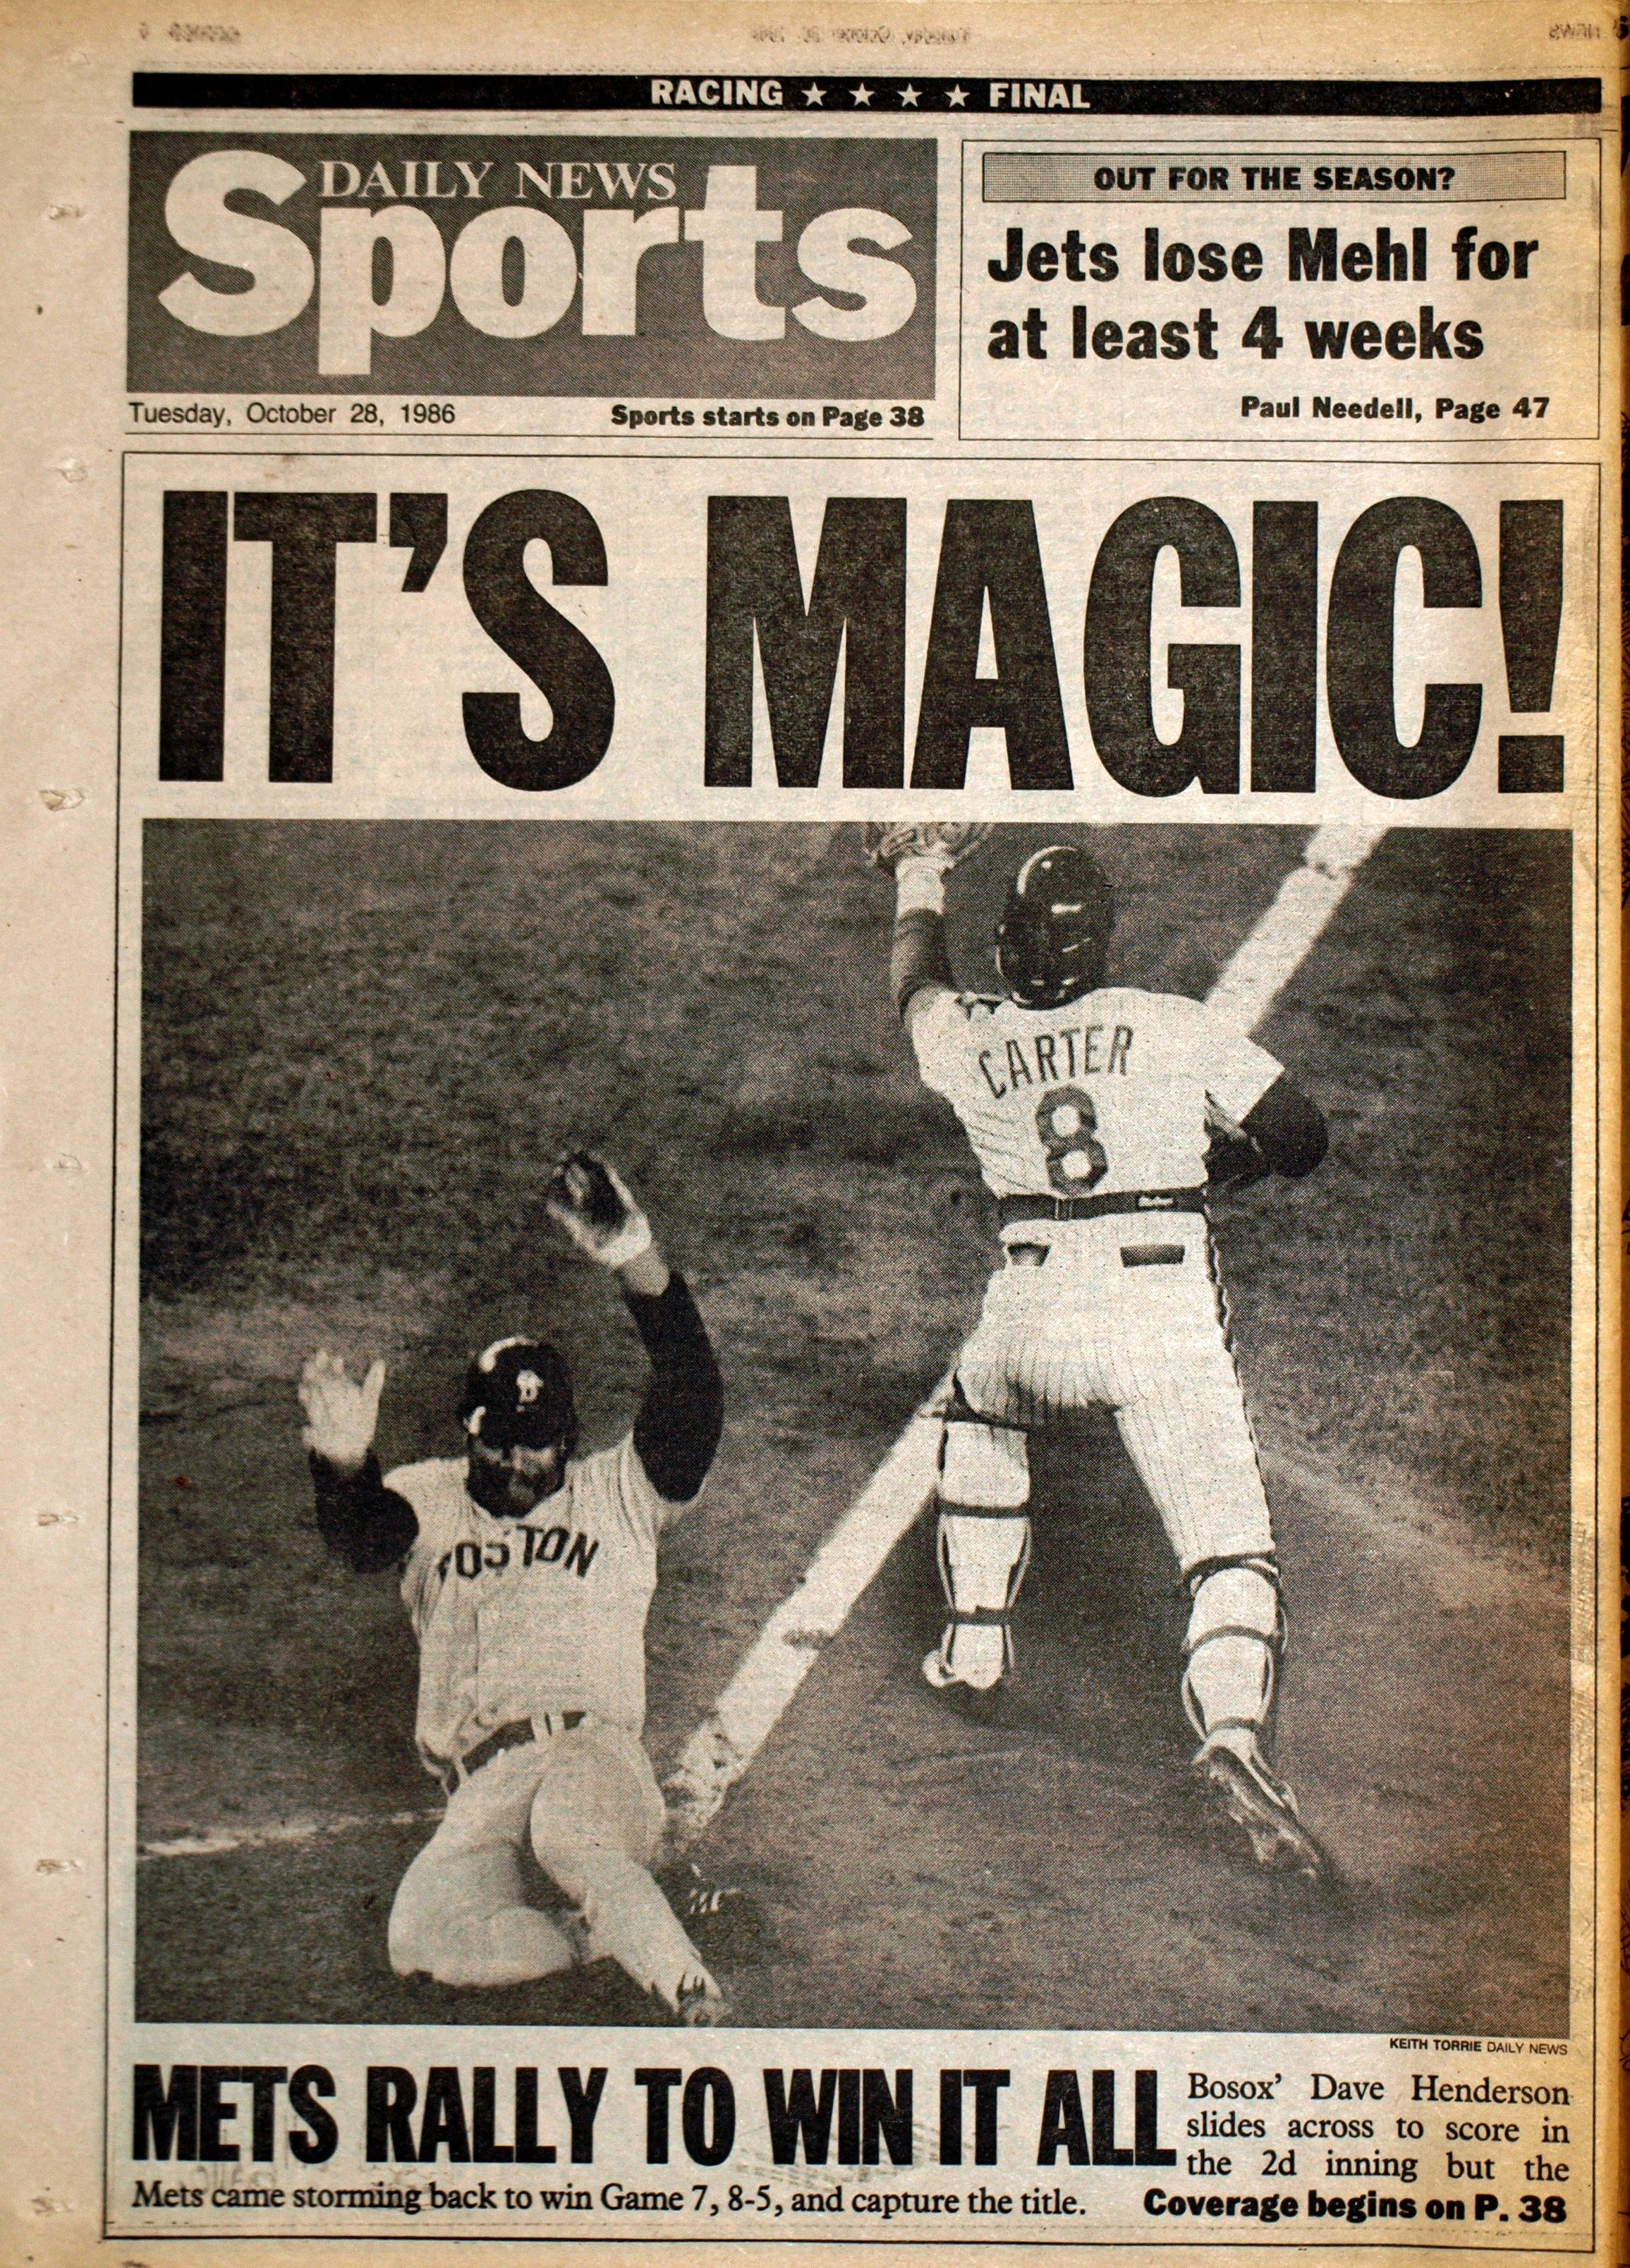 1986 World Series 1986 World Series Game